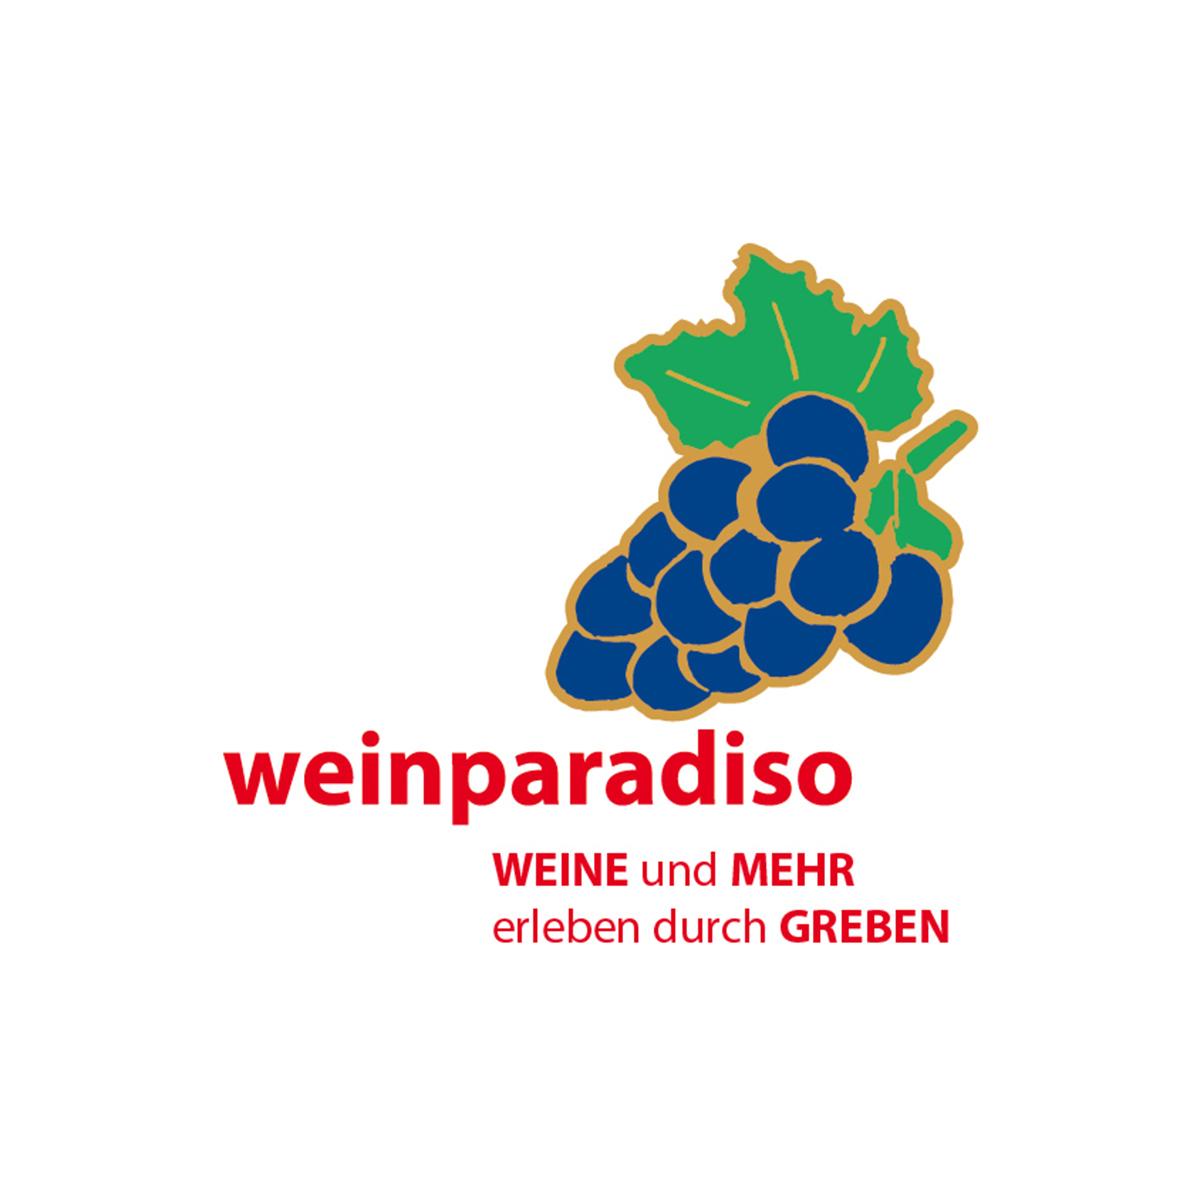 Weinparadiso